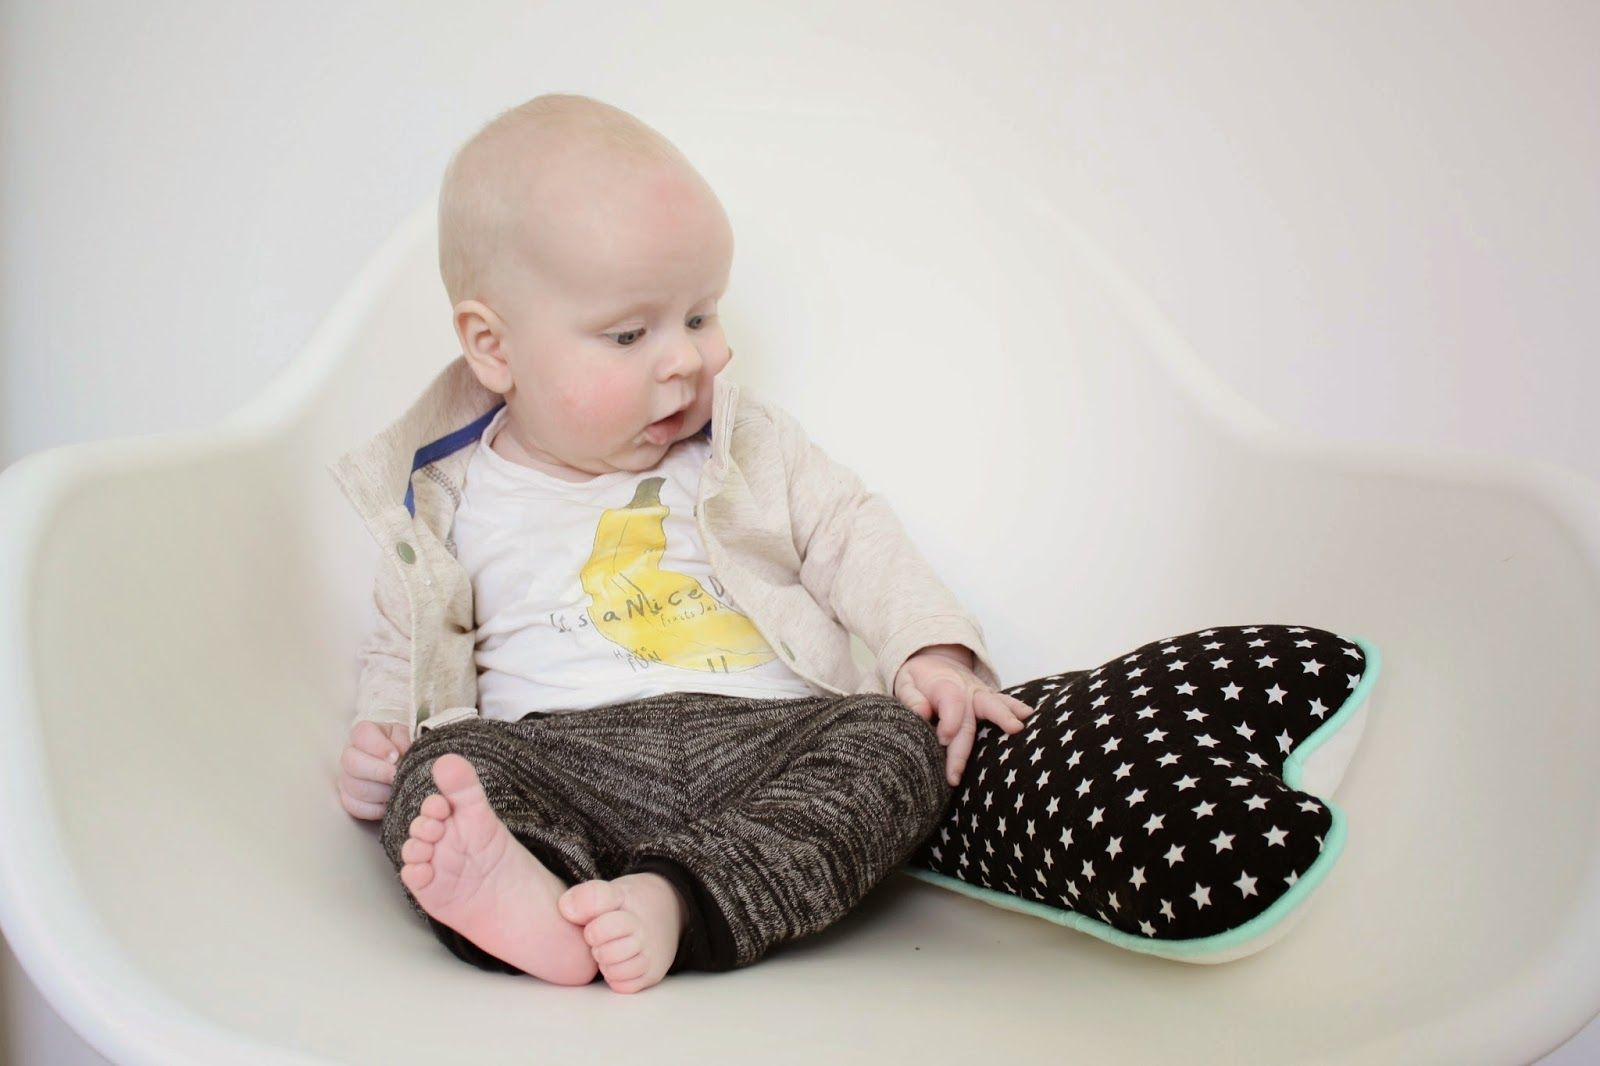 baby sewing: vest with pants | baby kleding naaien: hippe broek met vest